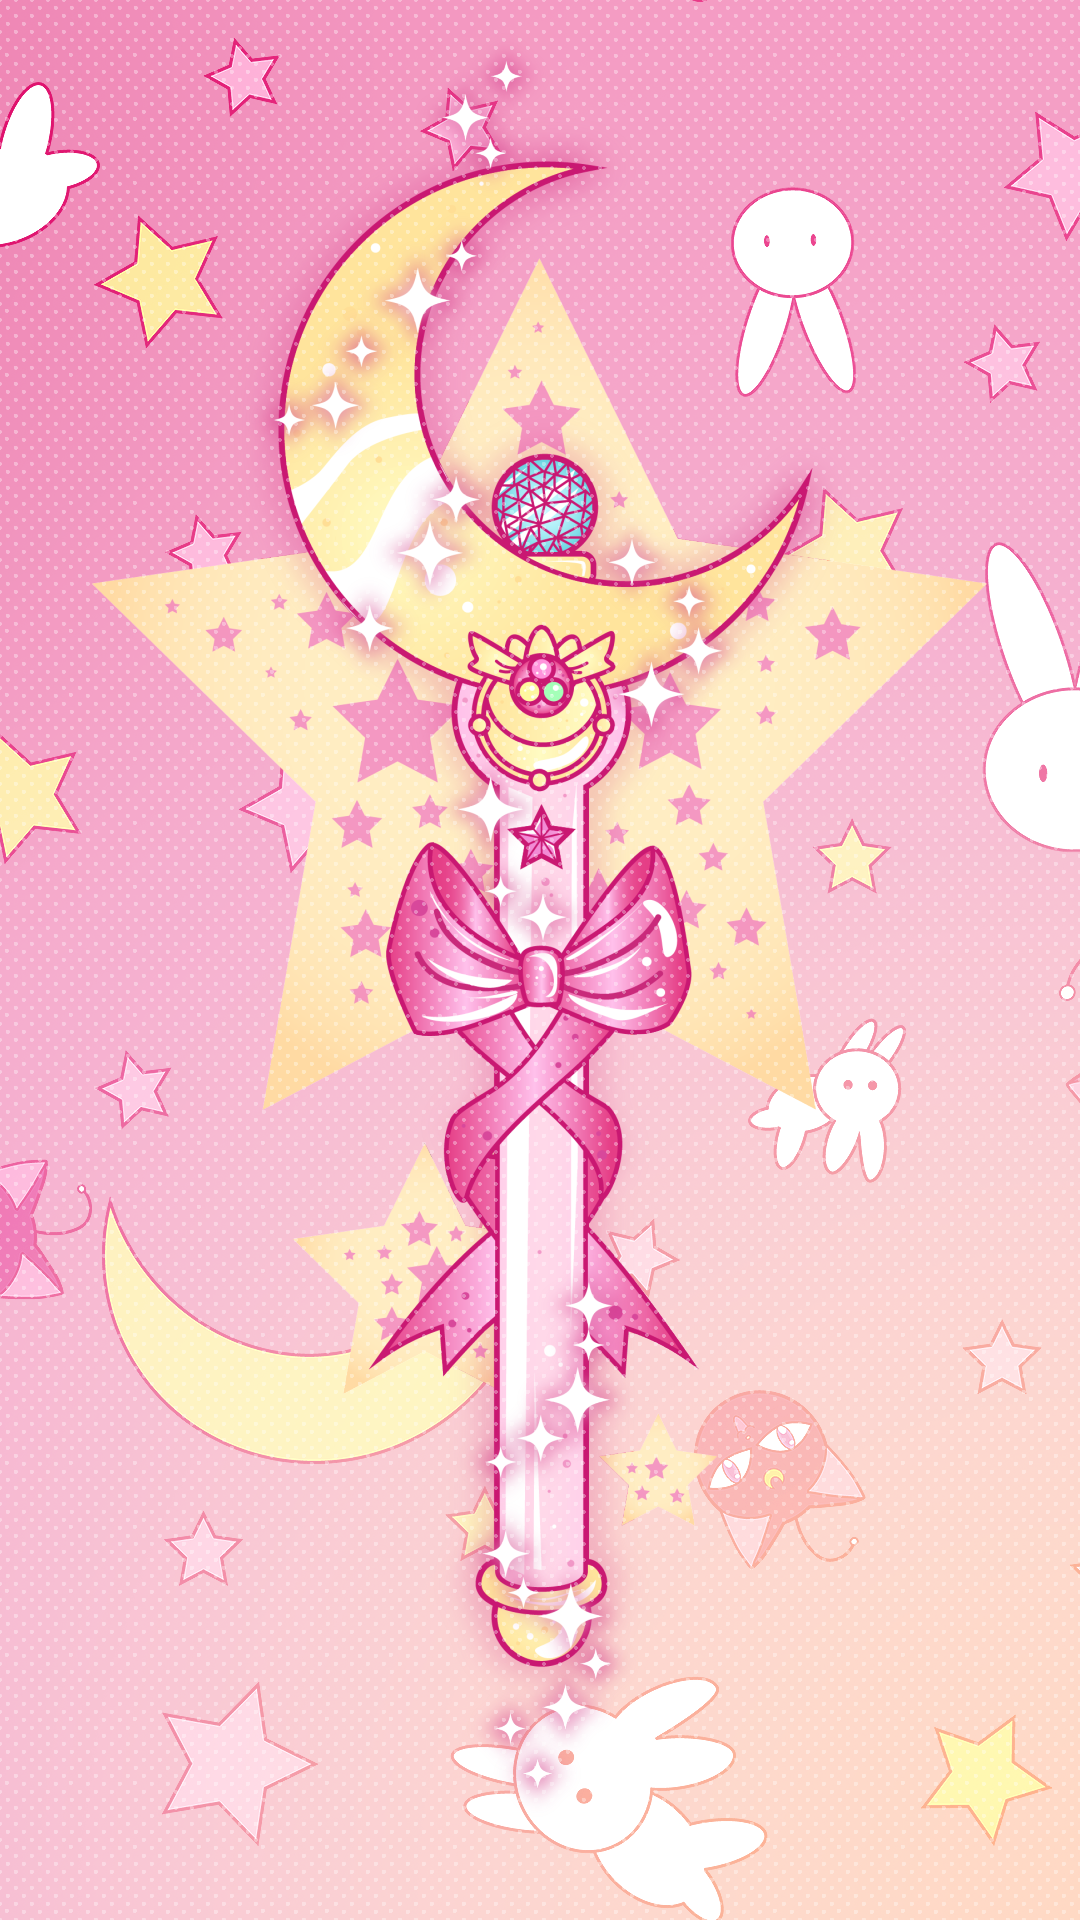 Sailor Moon Cute Pink Wallpaper 1080 X 1920 HD Anime Otaku Magical Girl